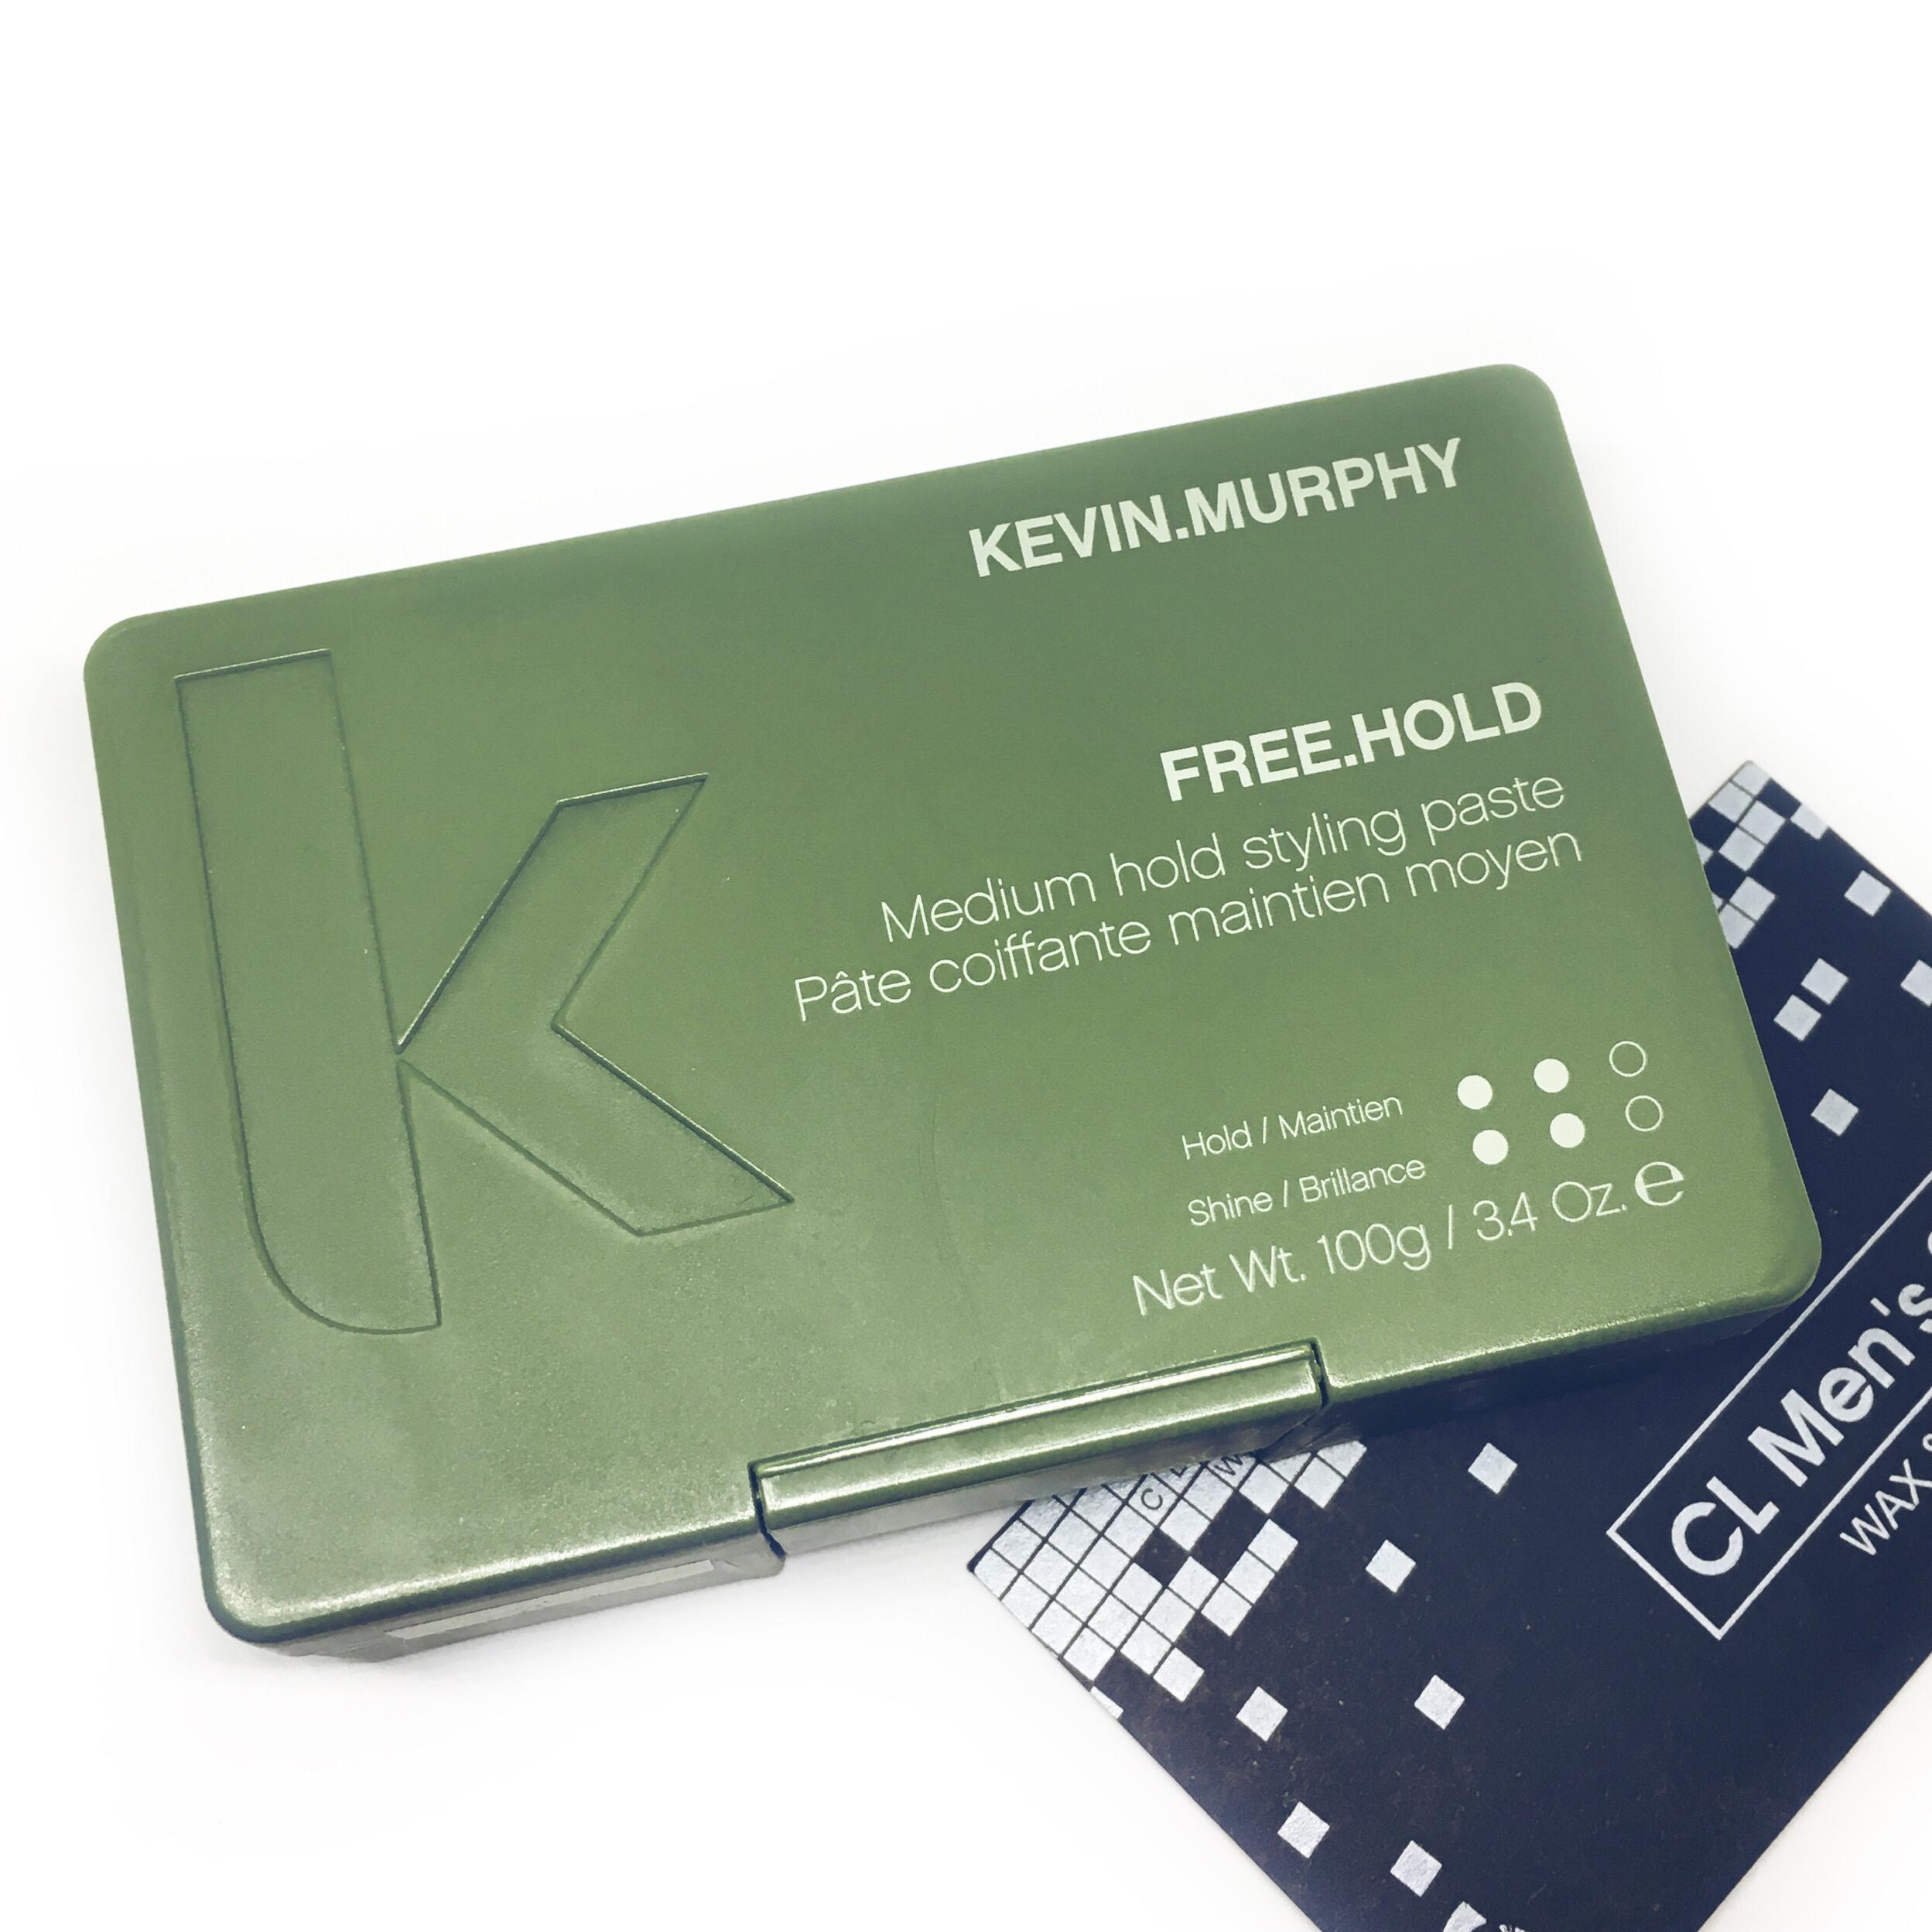 Kevin Murphy Free Hold giá rẻ